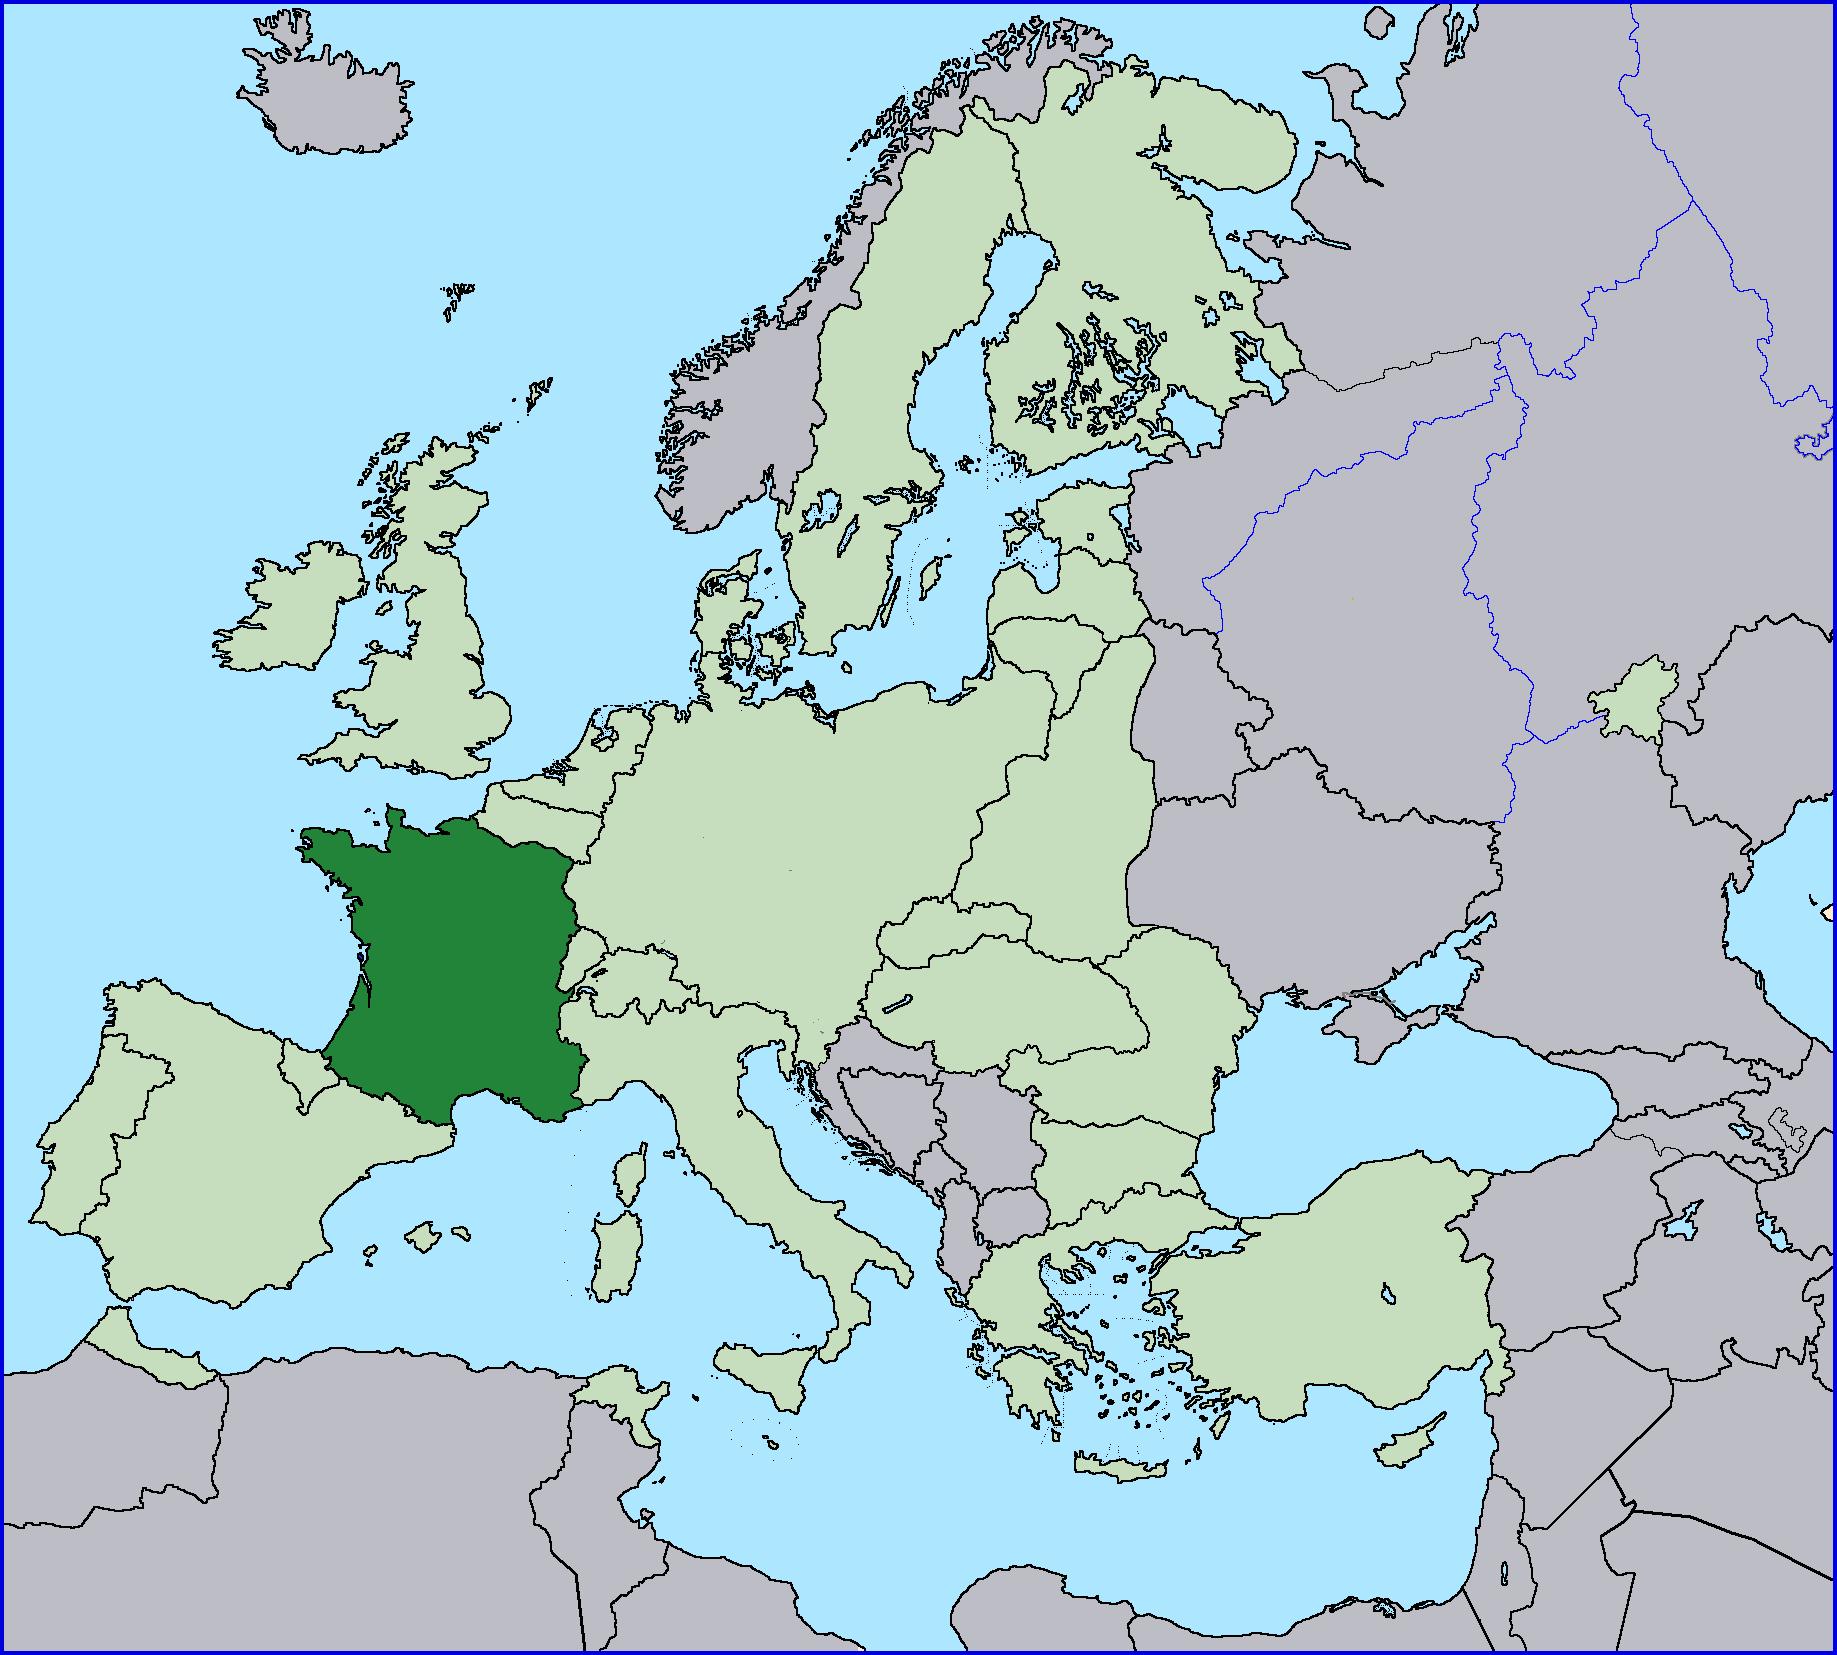 Image Location France EU Europepng Alternative History FANDOM